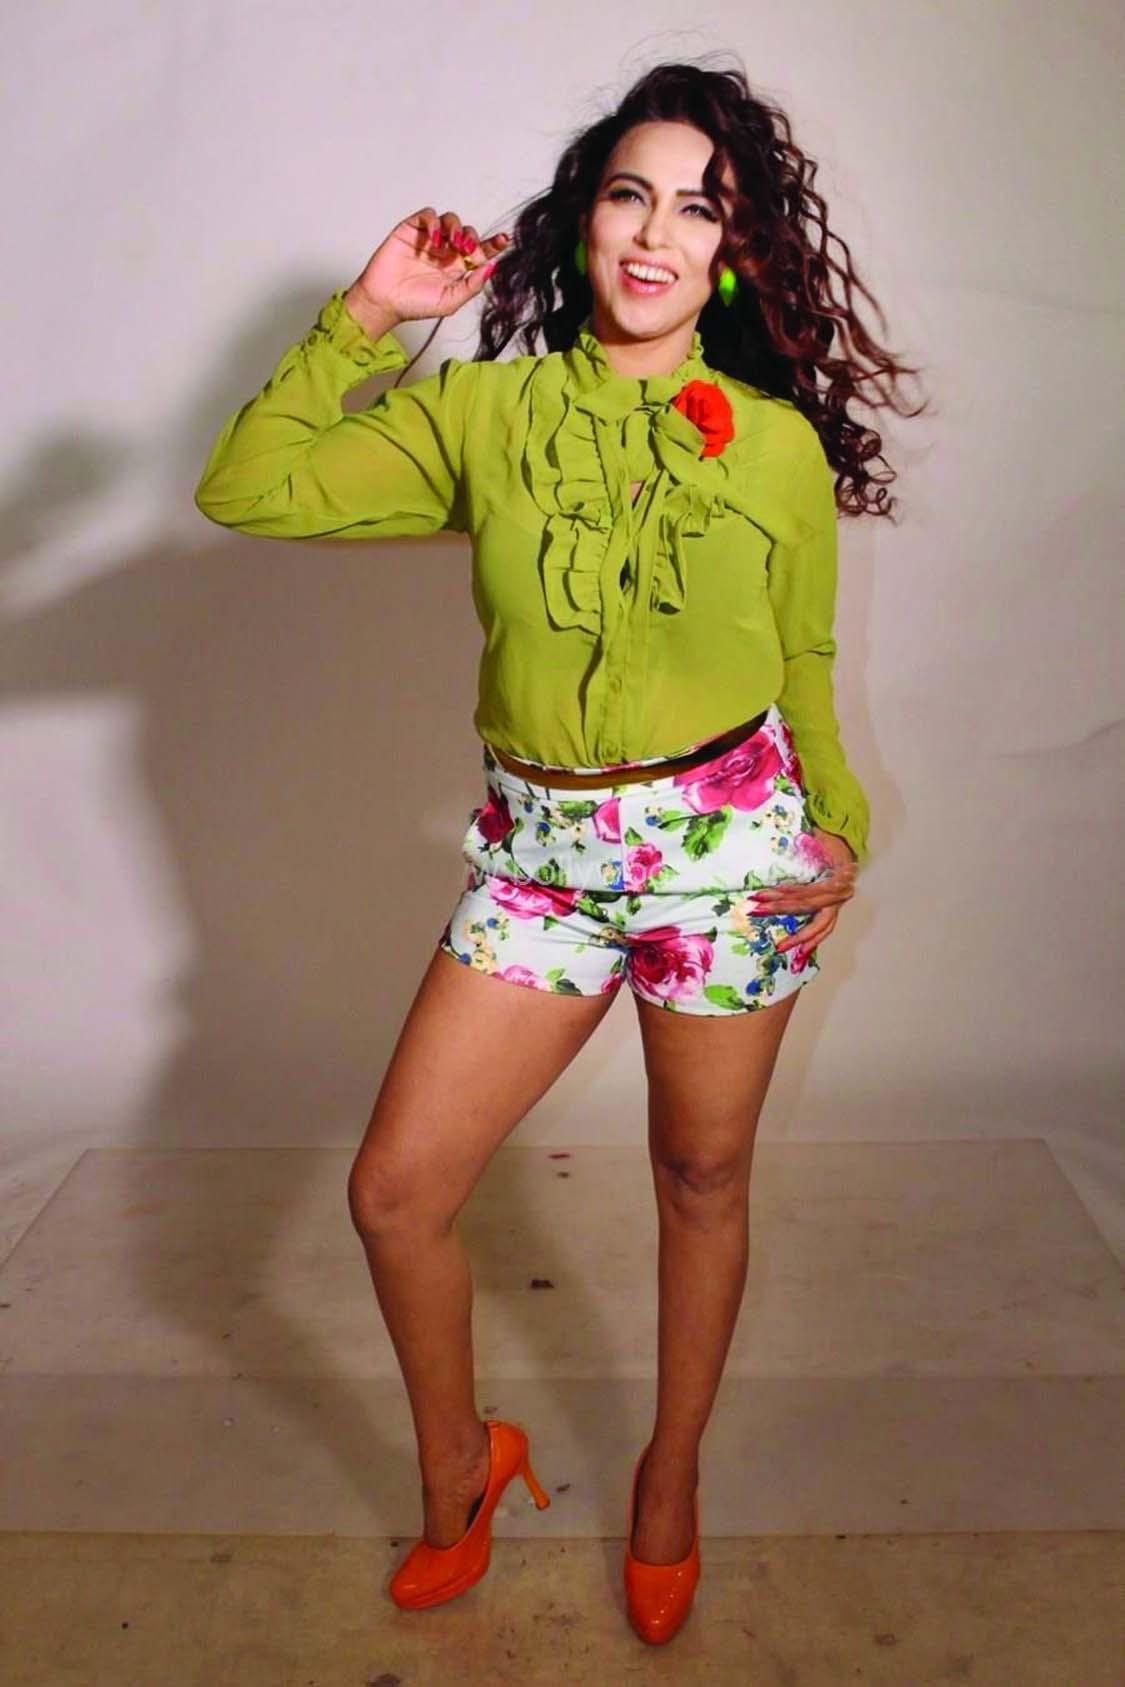 Fashion Diva Myrra Khan steps in a new territory